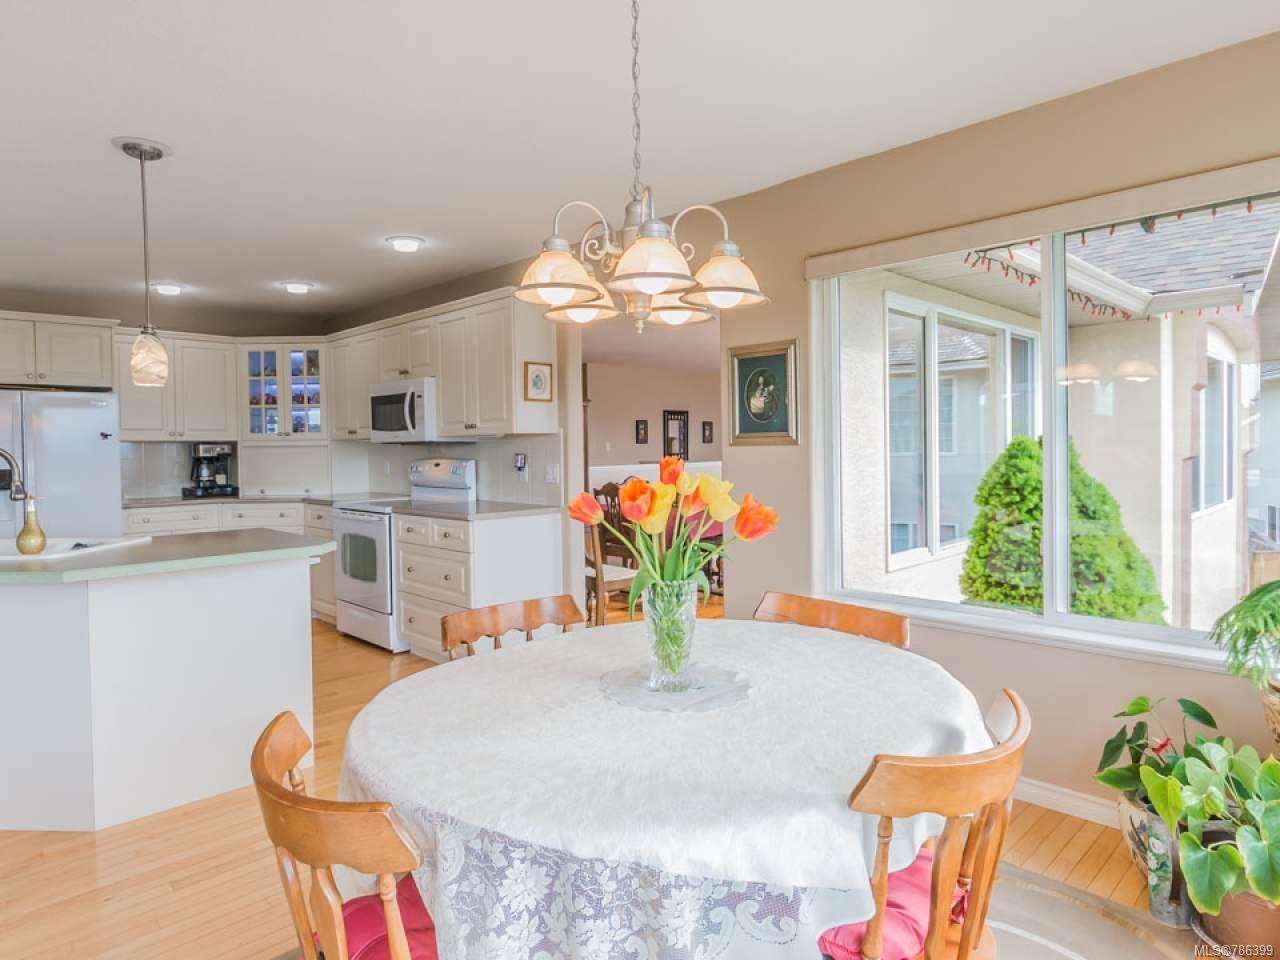 Photo 6: Photos: 5371 HIGHRIDGE PLACE in NANAIMO: Na North Nanaimo House for sale (Nanaimo)  : MLS®# 786399